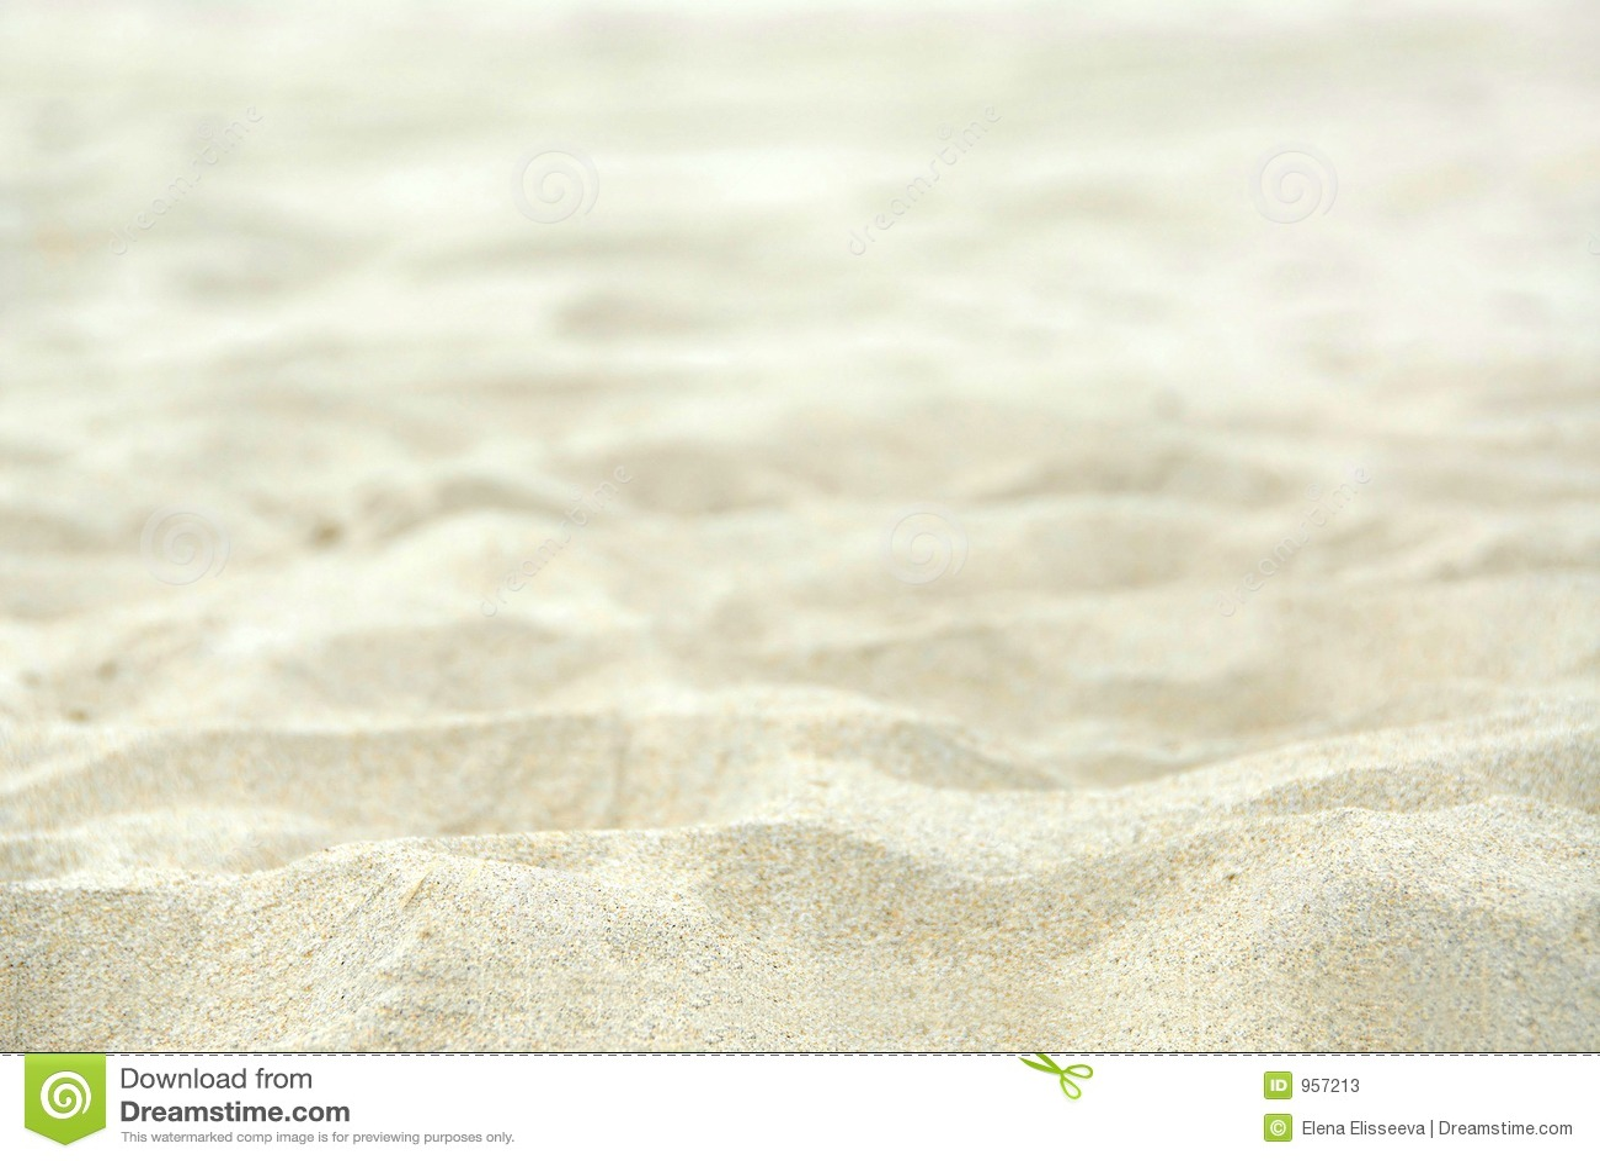 Fundo da areia